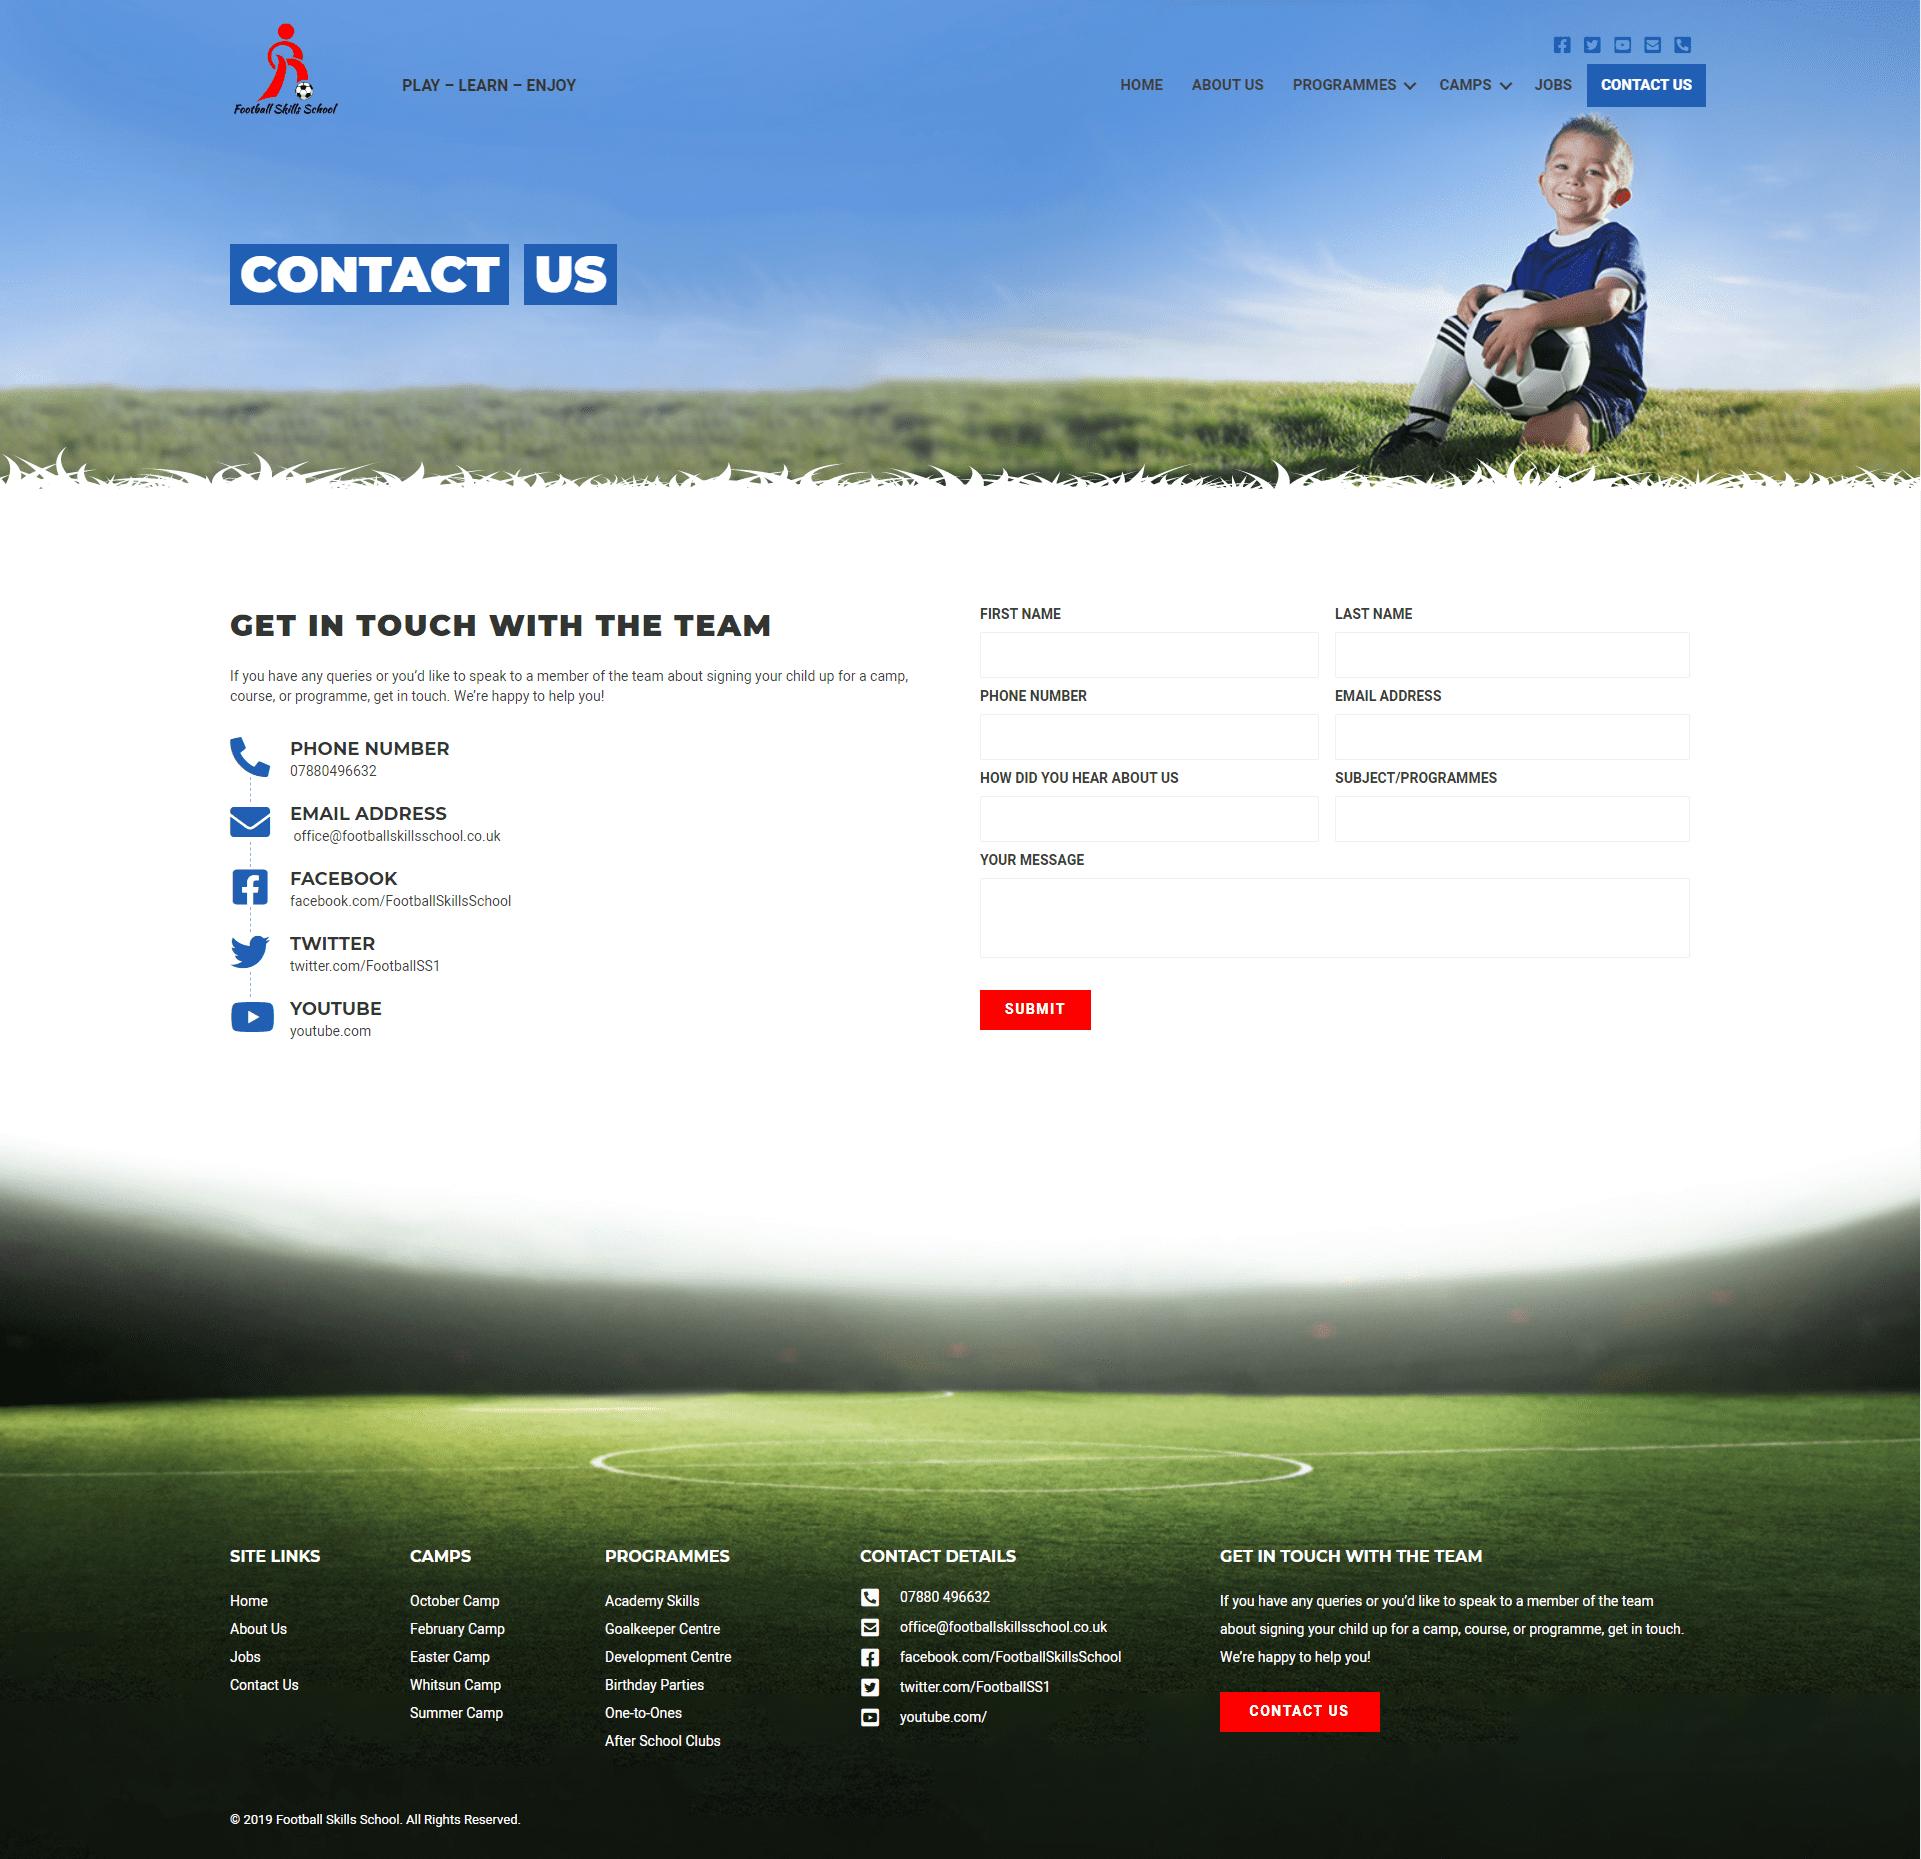 screencapture-footballskillsschool-co-uk-contact-us